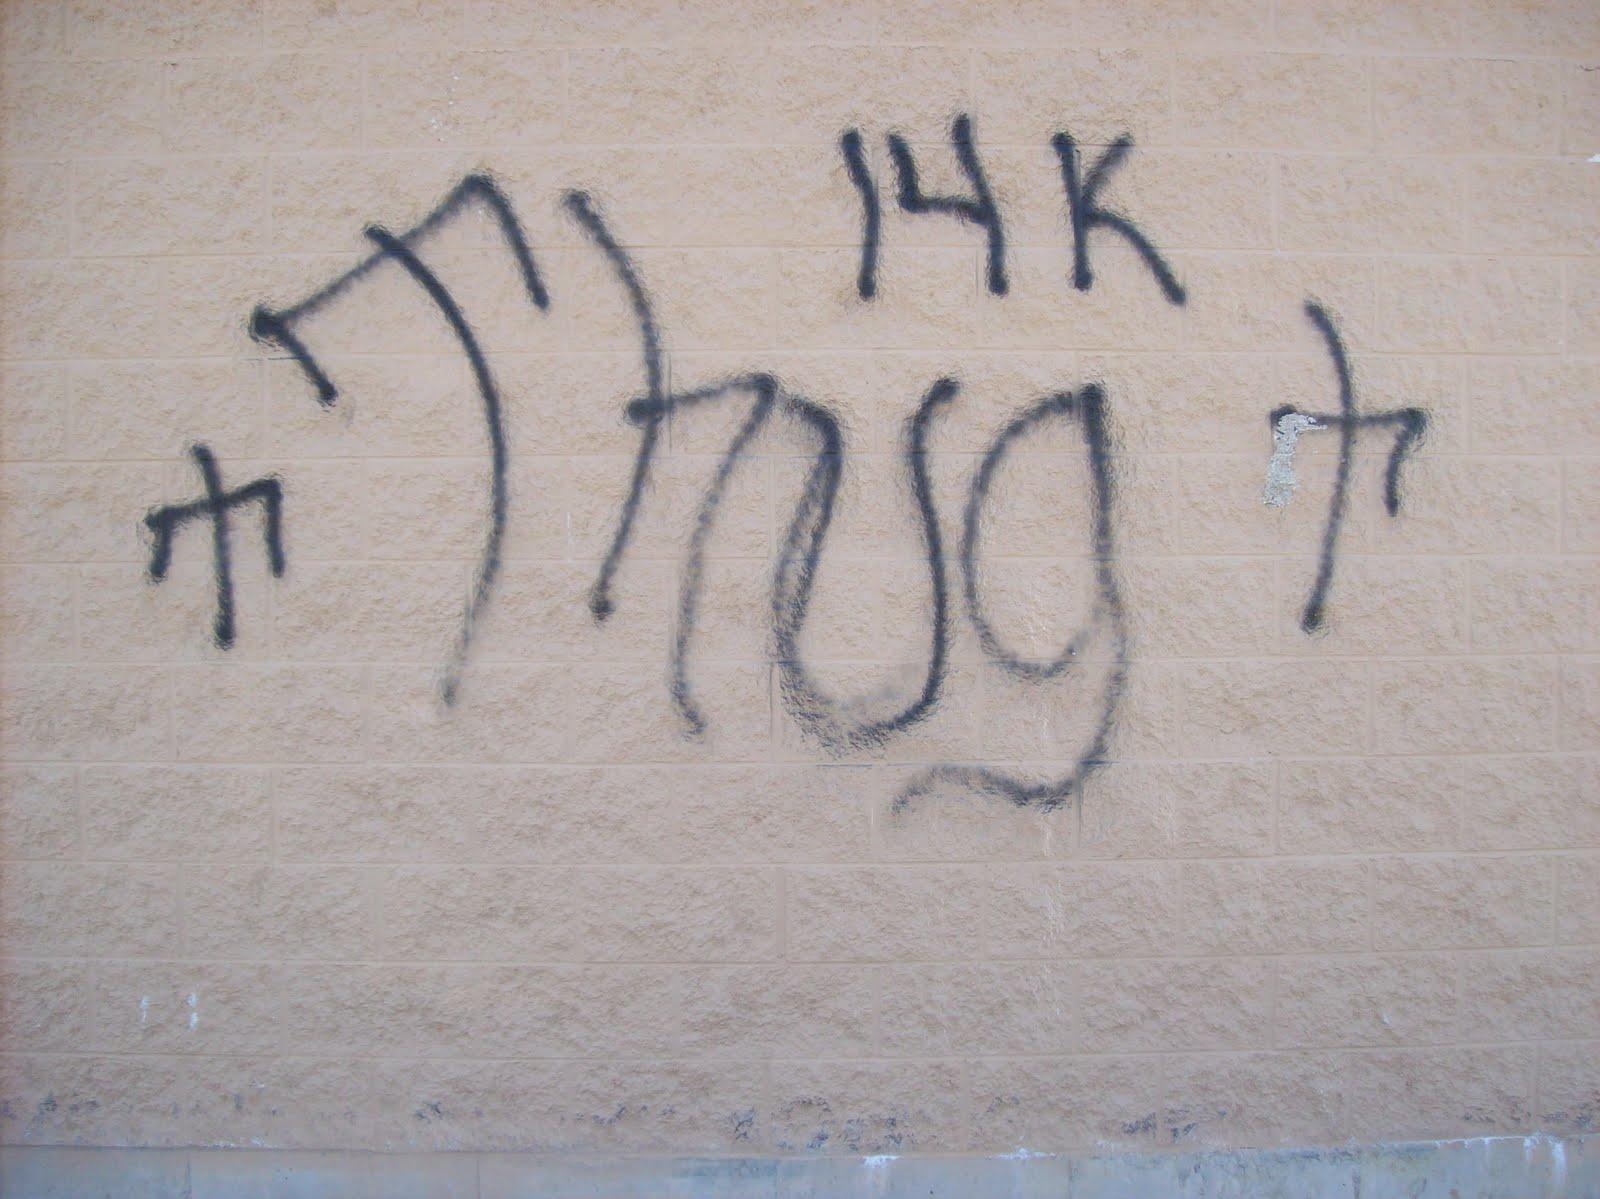 Woodstock Advocate Grafitti On Aldis Wall